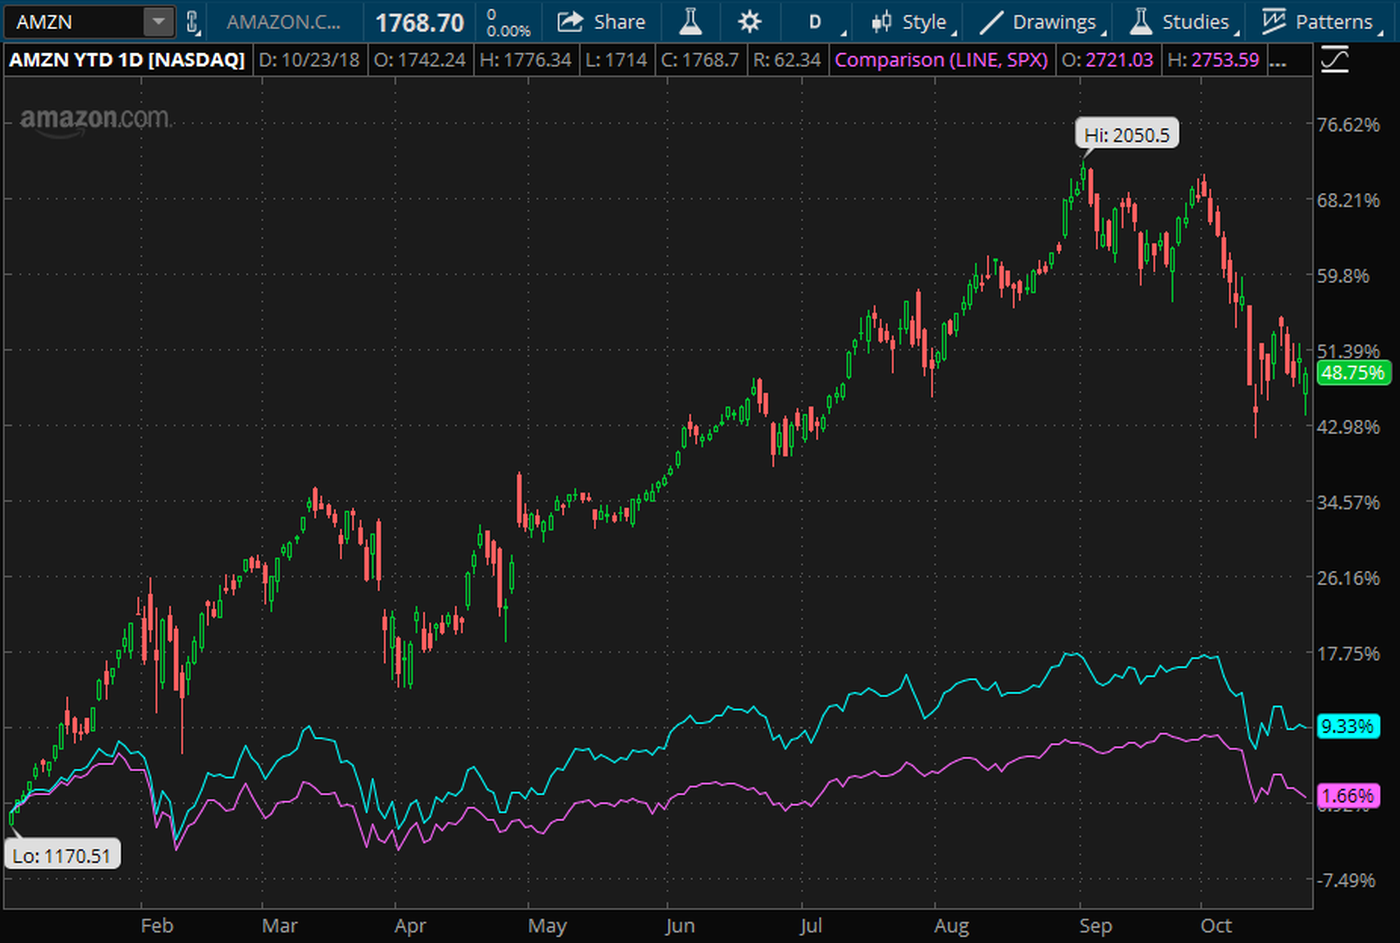 amzn stock earnings